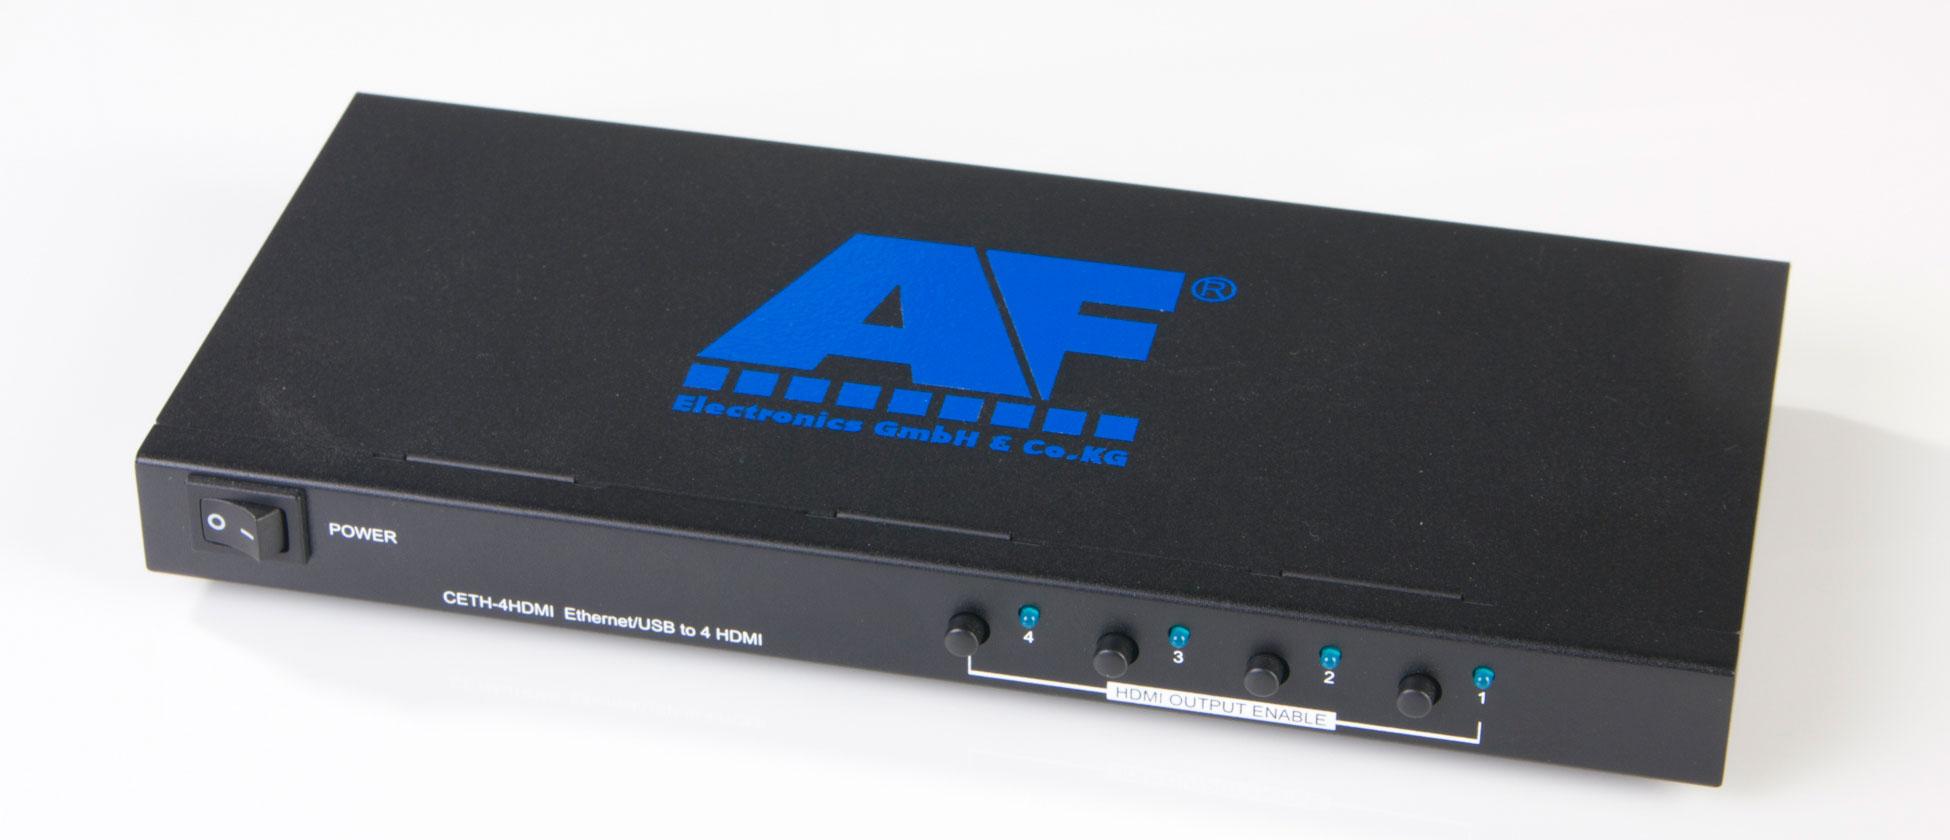 PC to TV Signaltransmission - Retail electronics, HDR Verteilverstärker